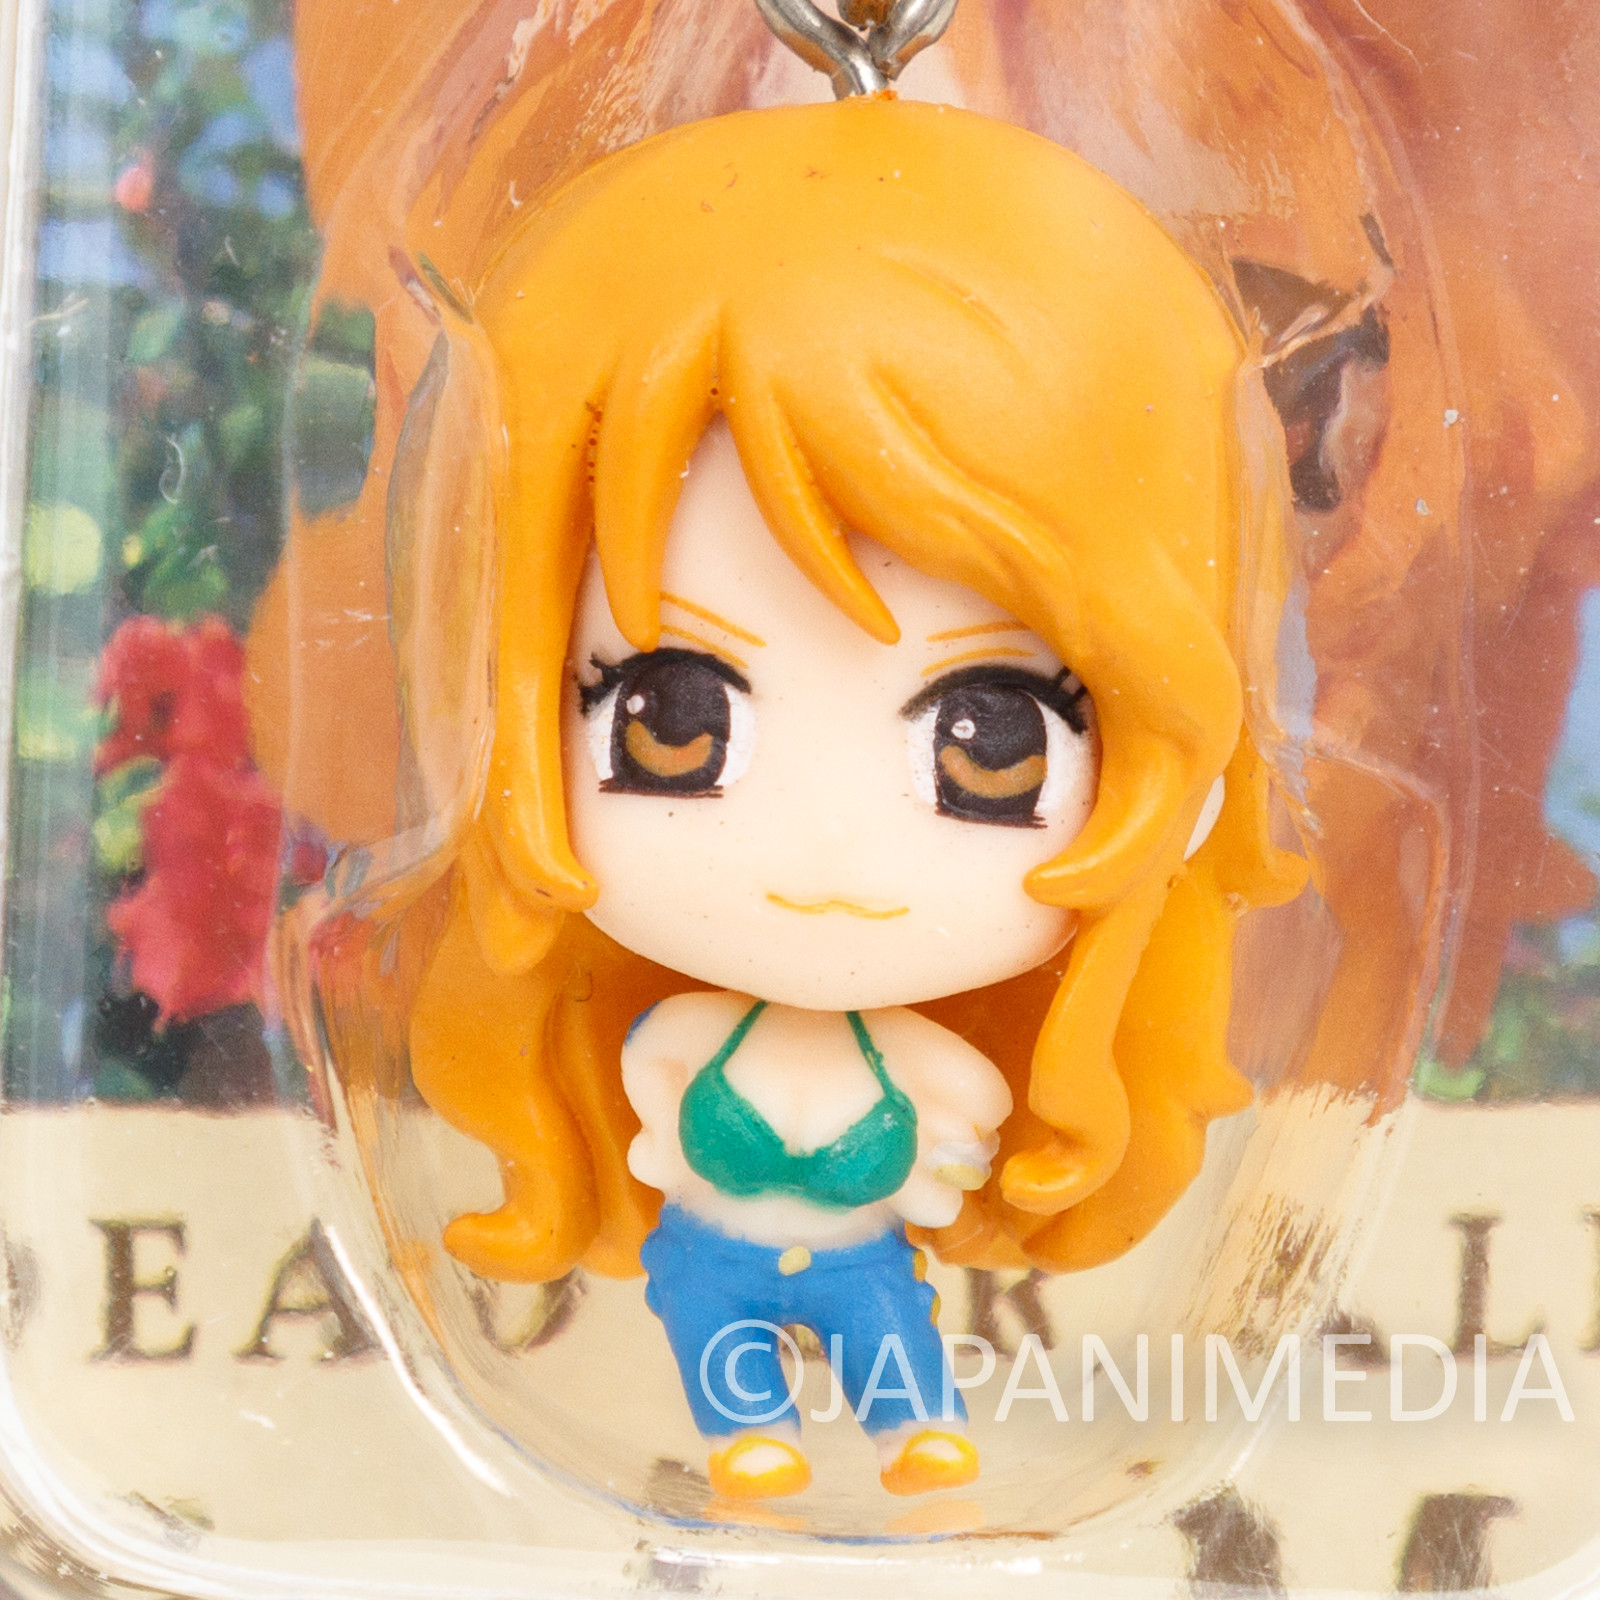 One Piece Nami Mini Figure Chara Fortune Megahouse JAPAN ANIME